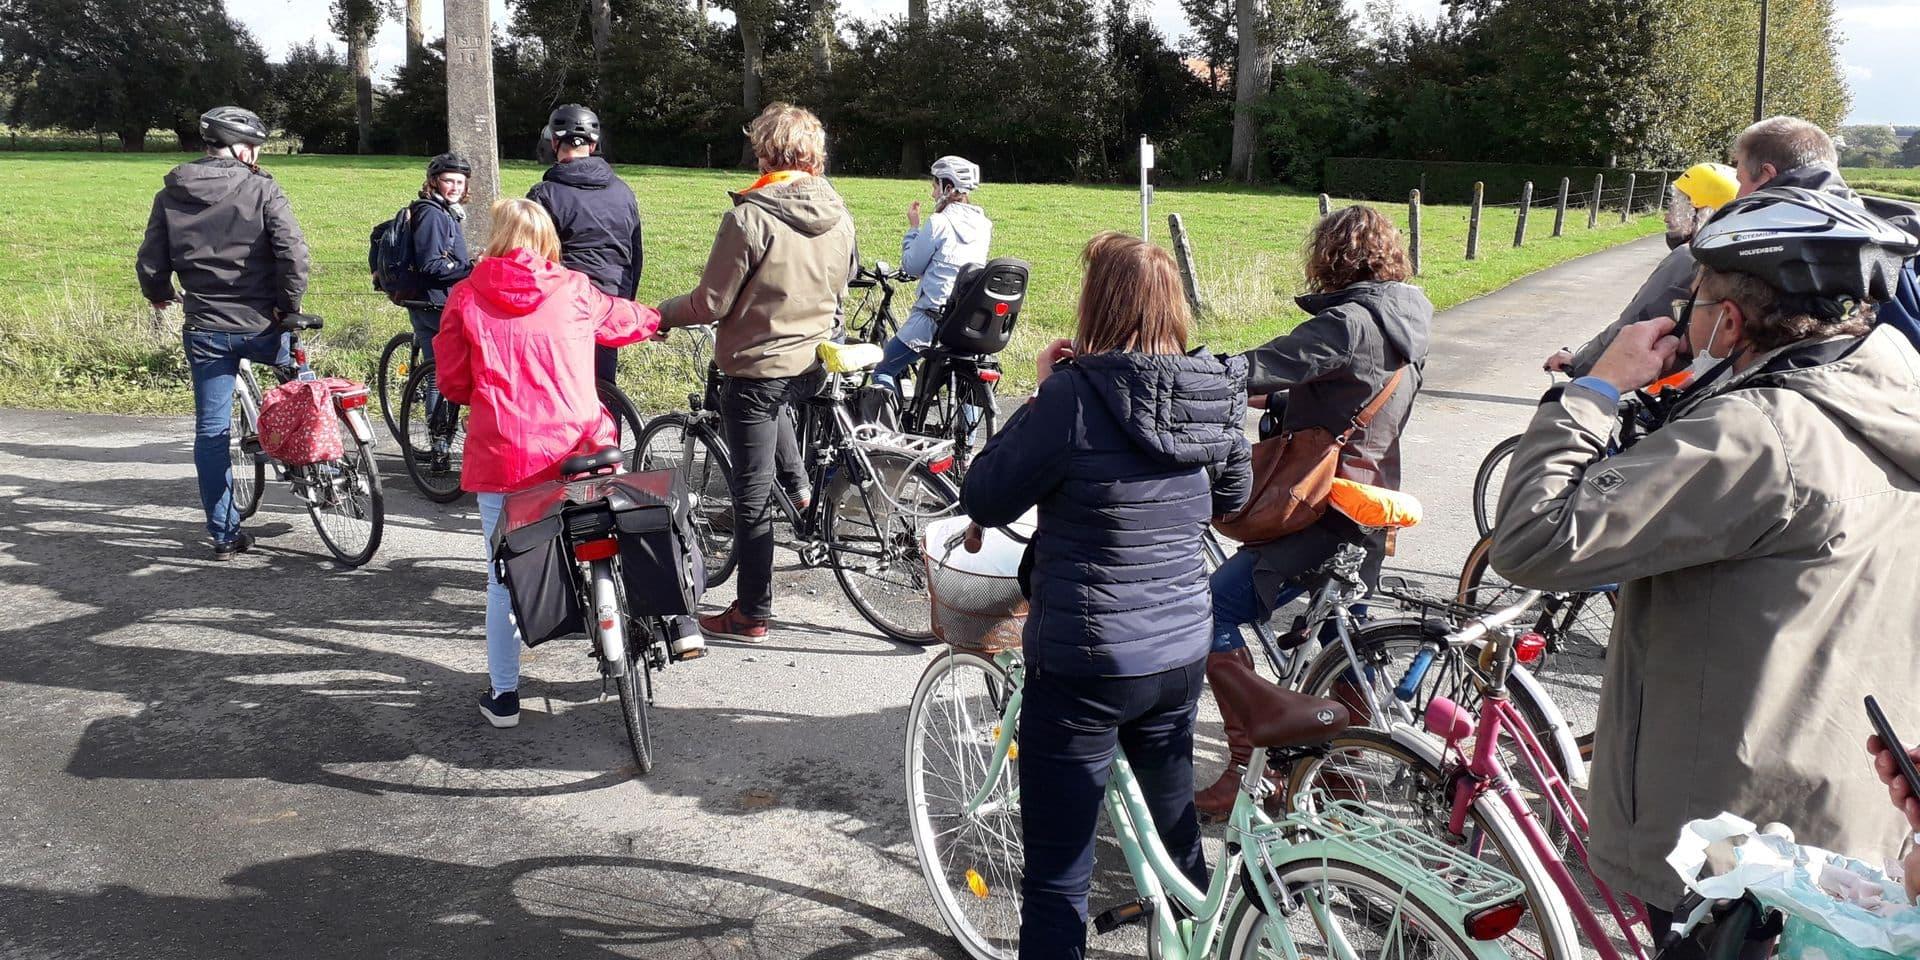 Enghien : en roue libre au cœur de la vallée de la Marcq